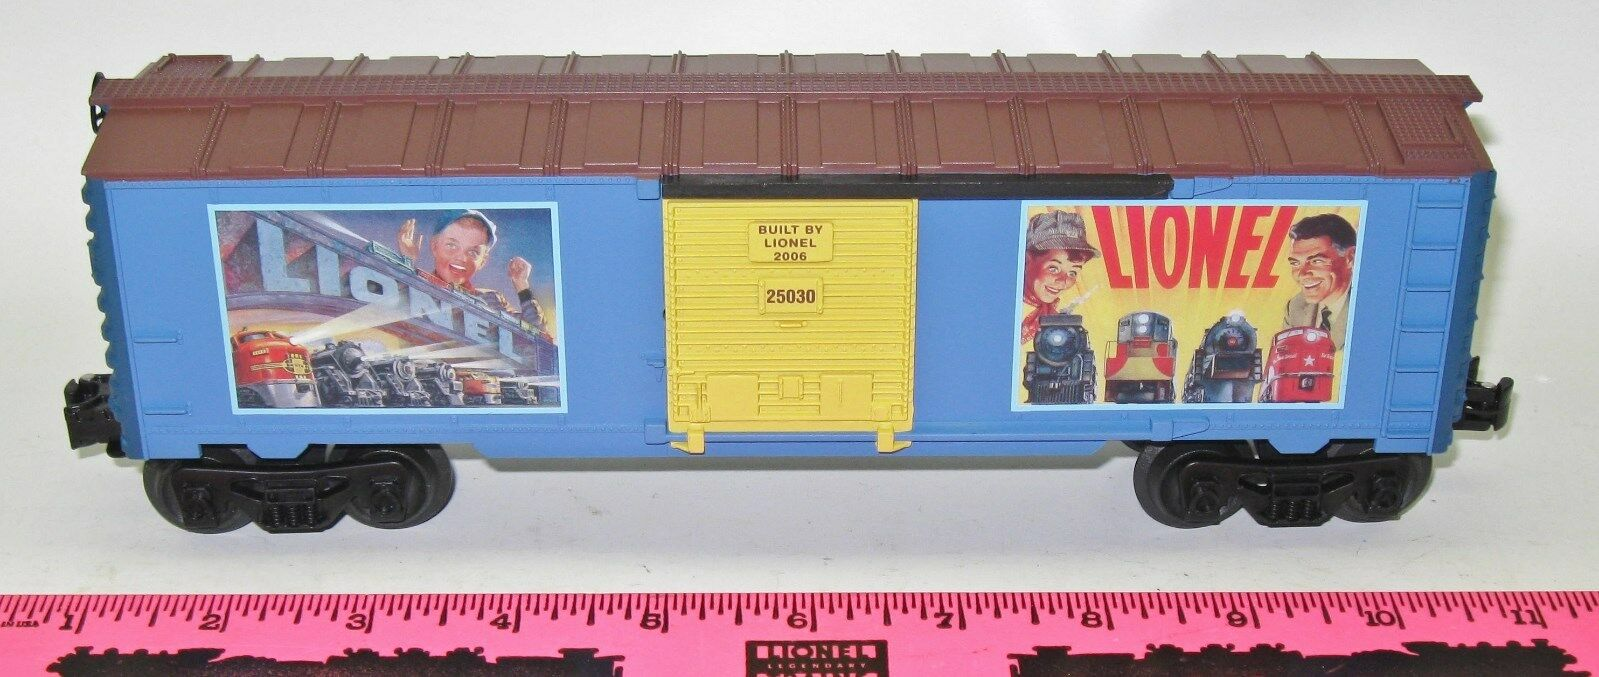 Lionel New 25030 boxcar with vintage lionel artwork